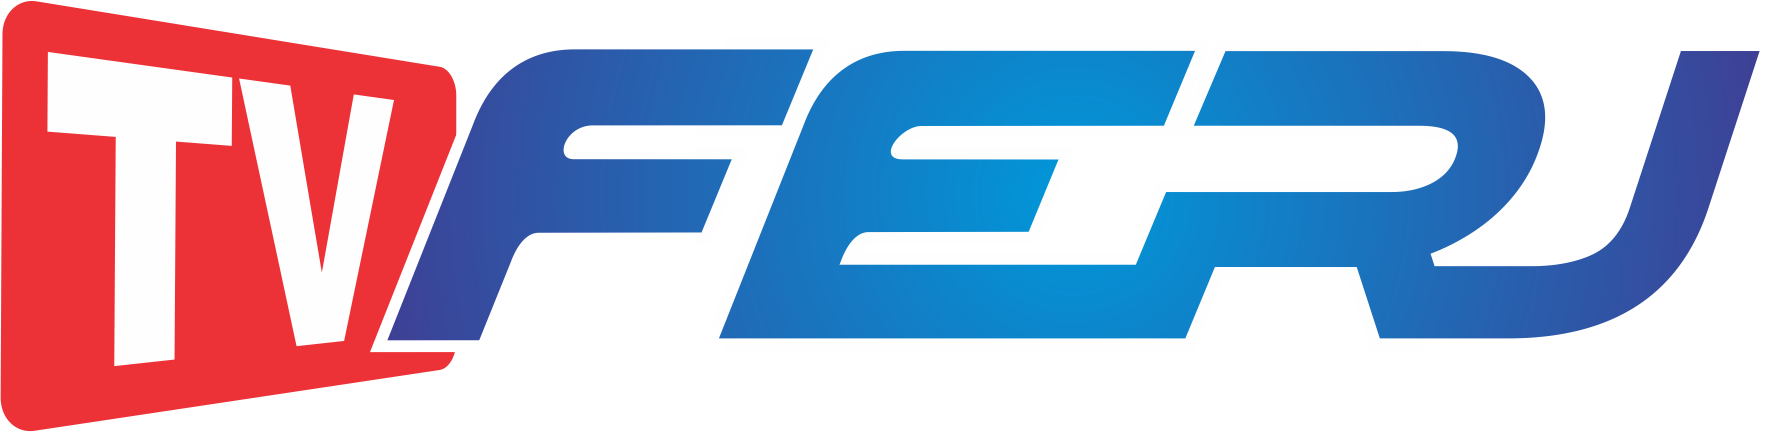 TV FERJ